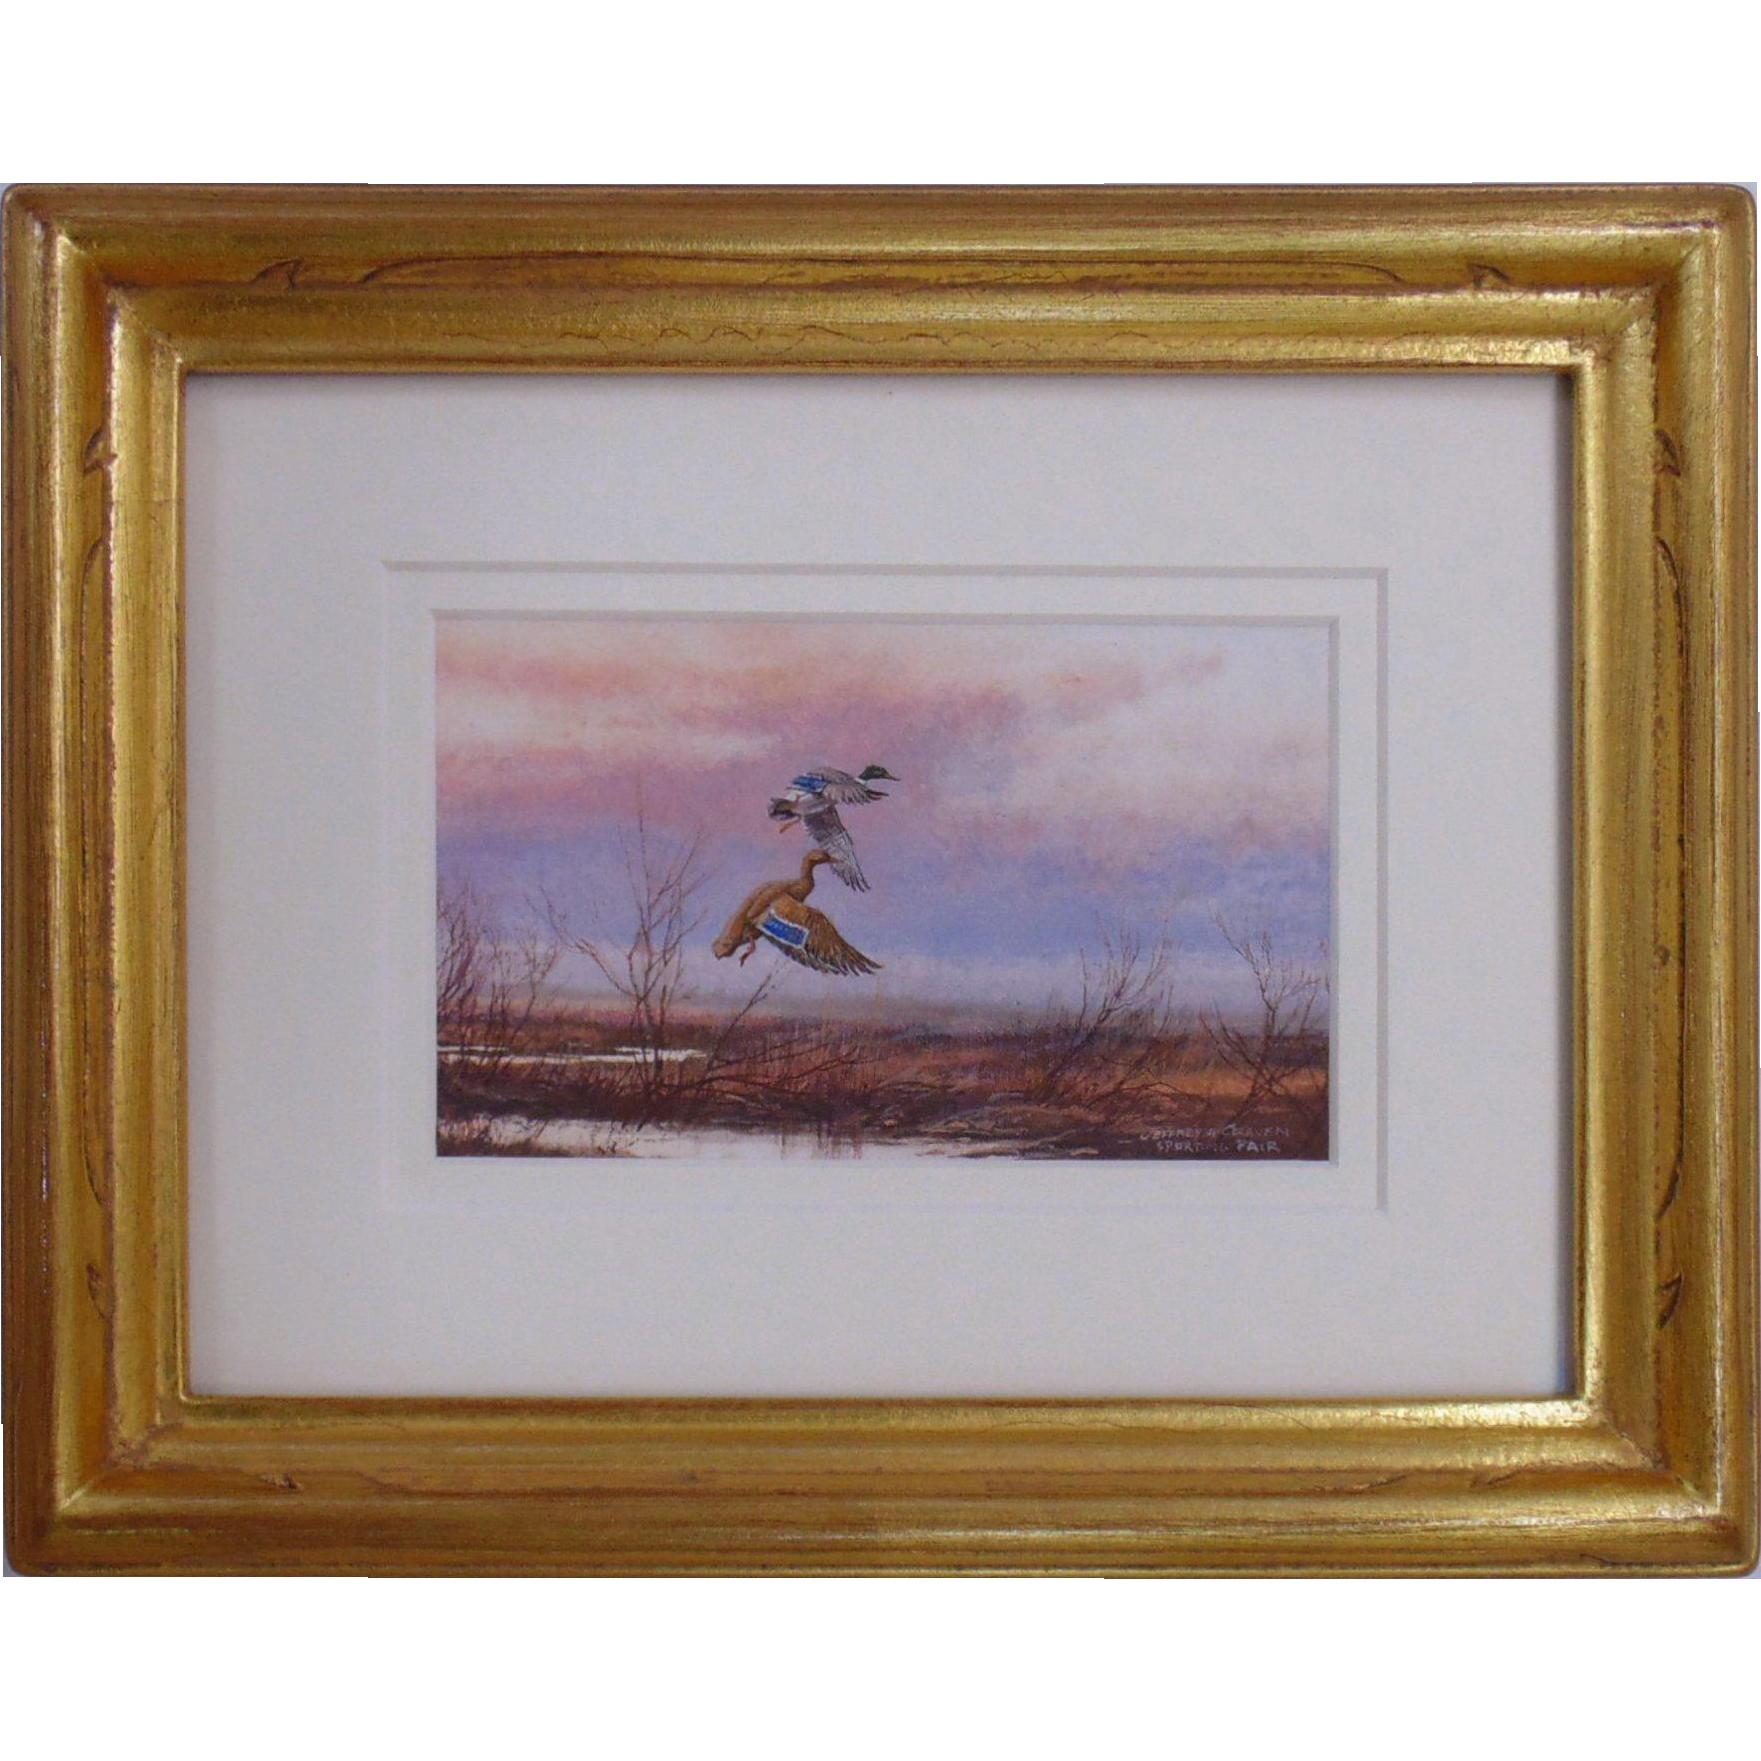 Miniature Watercolor Painting by Jeffrey Craven of Ducks